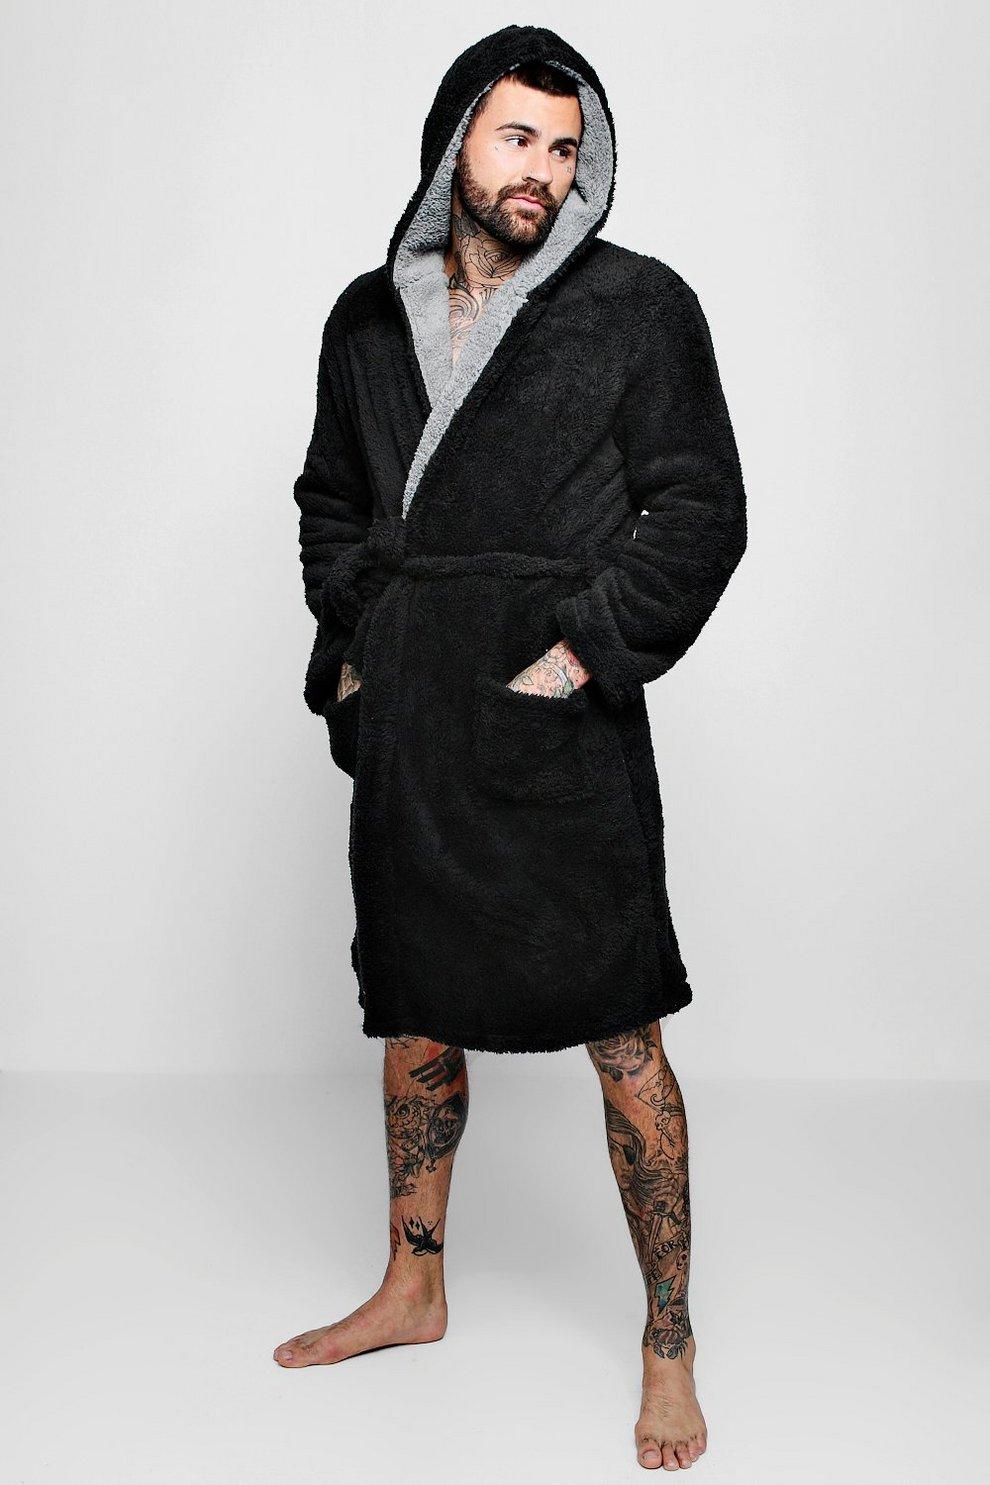 4029e84e02 Mens Shaggy Fleece Robe With Contrast Lining